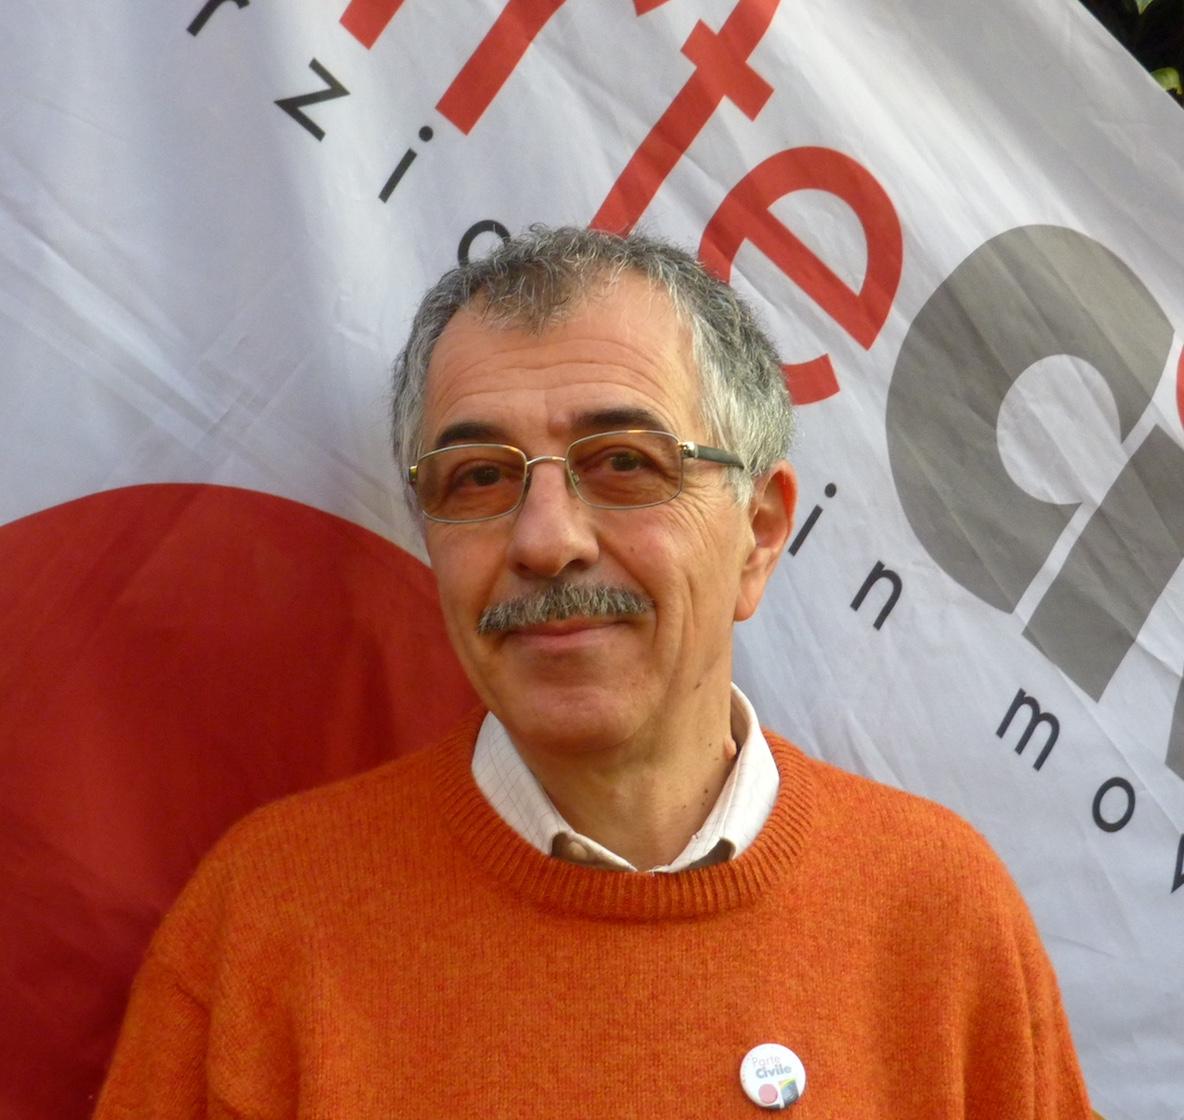 Guido Marinelli